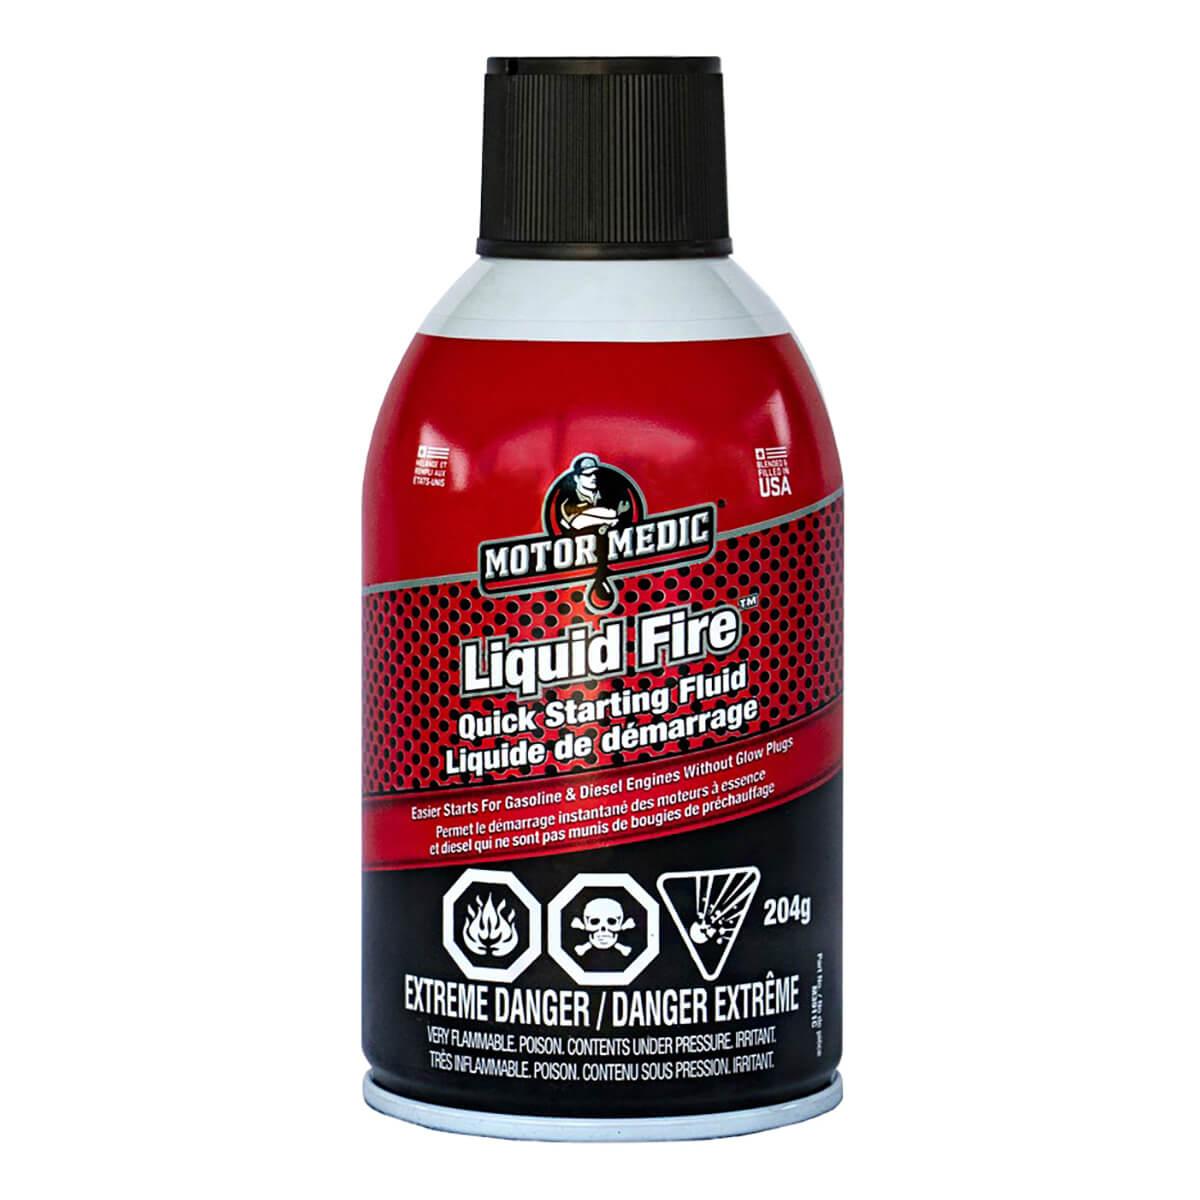 Motor Medic Liquid Fire Quick Starting Fluid - Aerosol 204g